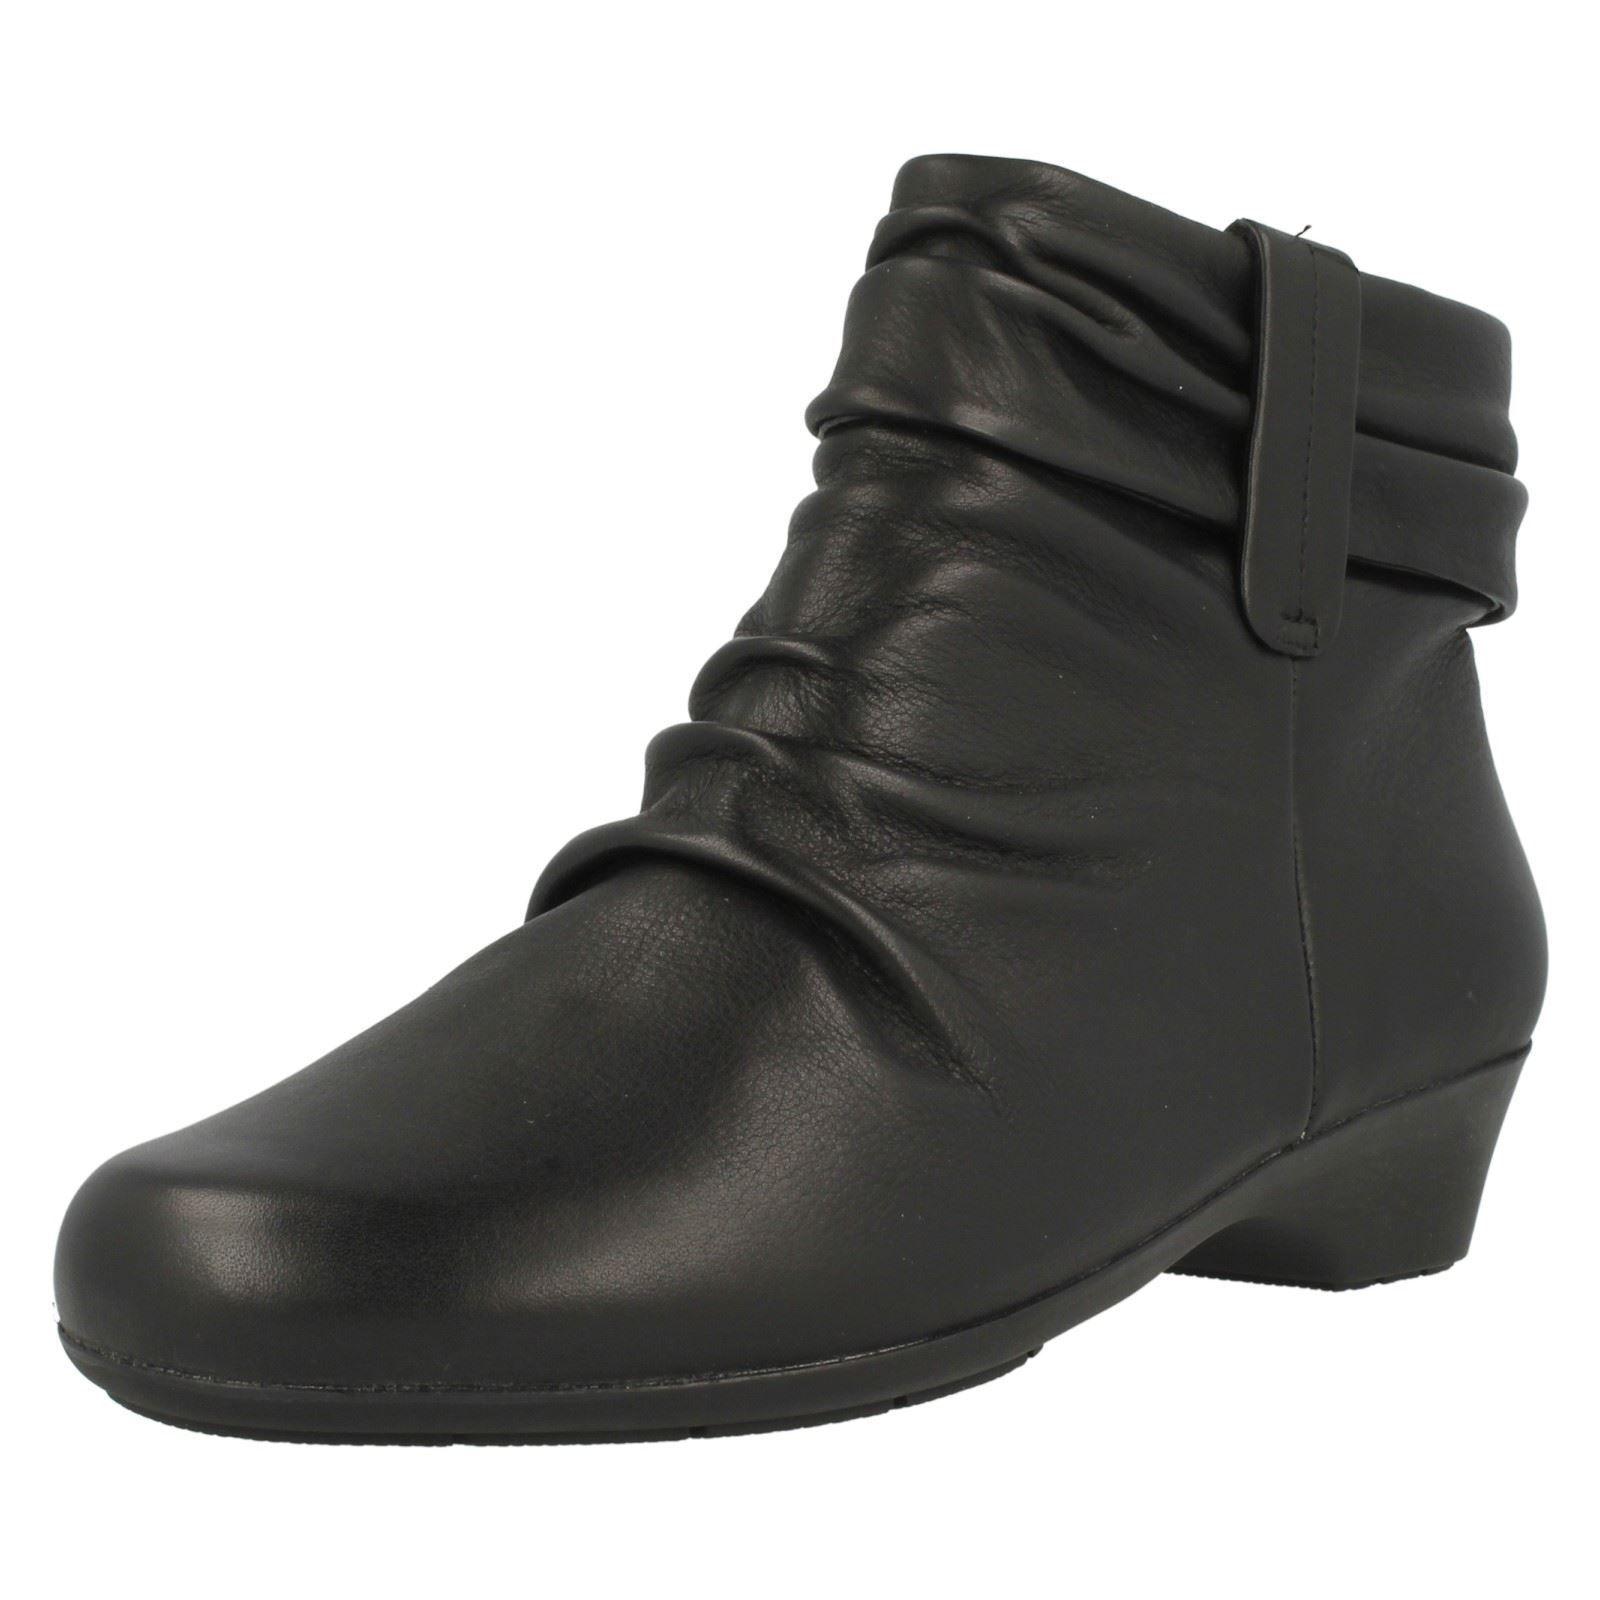 Clarks' Merrian Lyn 'Schwarze Leder Reißverschluss 3.2cm Blockabsatz Biker Boots